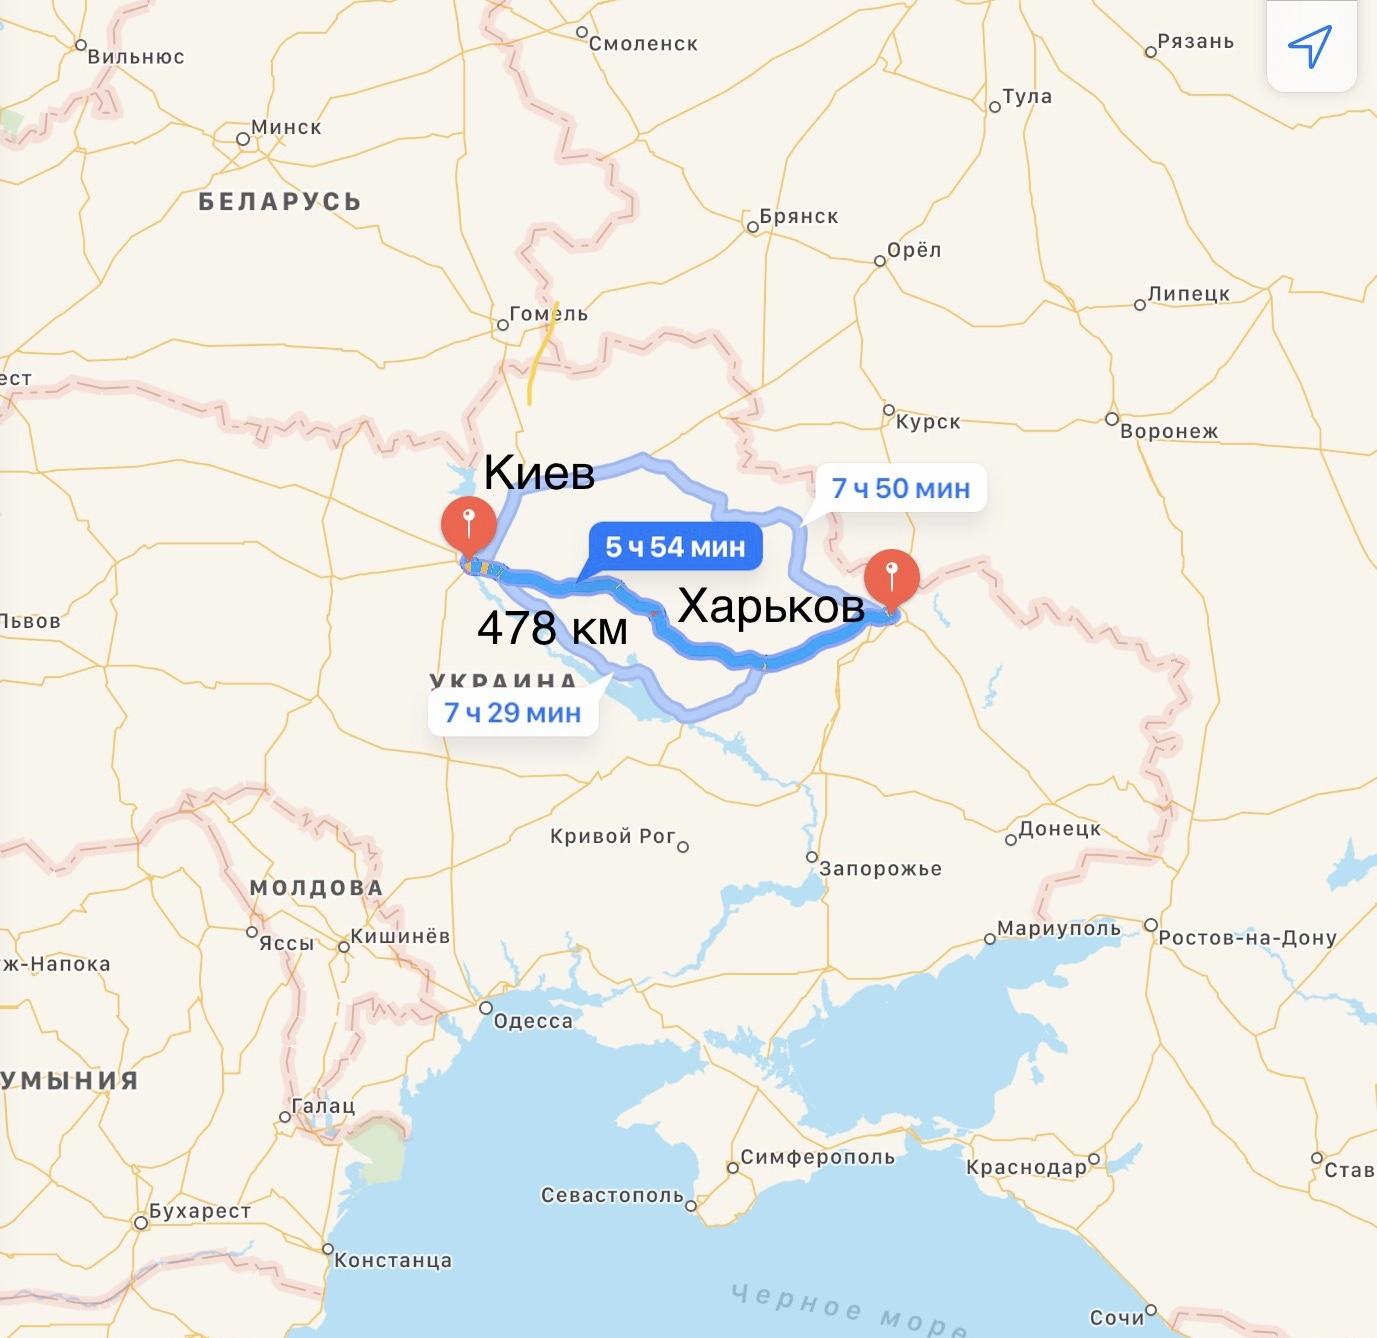 Грузоперевозки Киев – Харьков